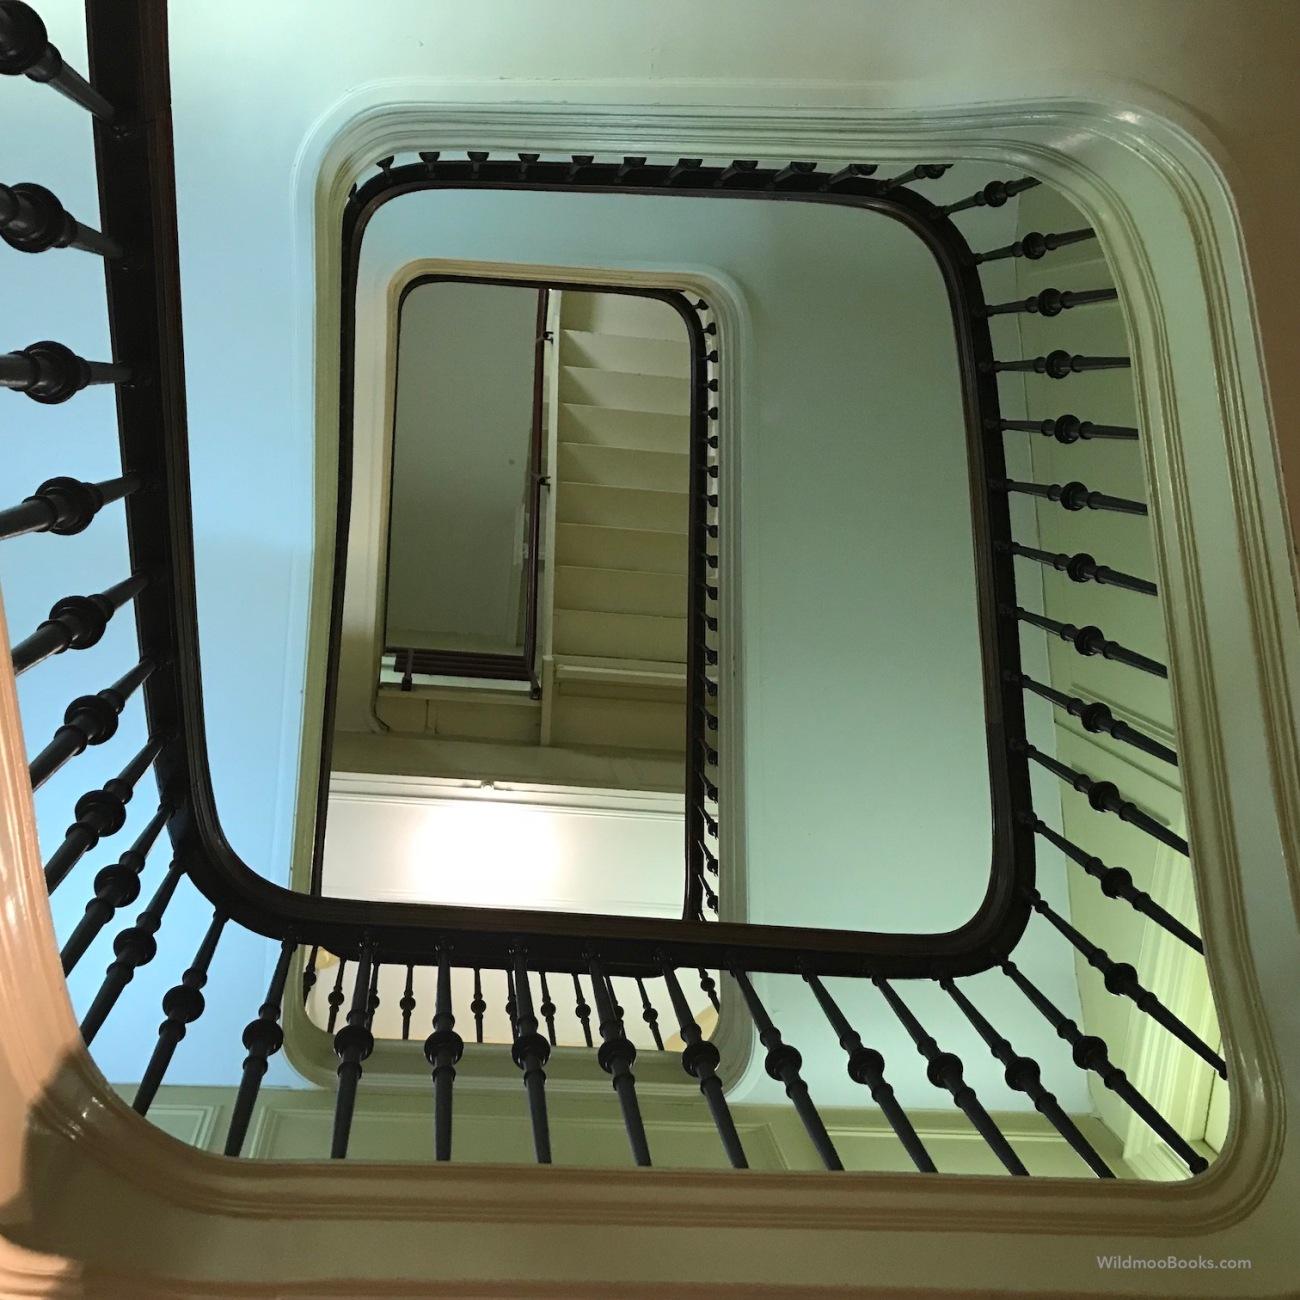 Stairwell at The New York Society (WildmooBooks.com)